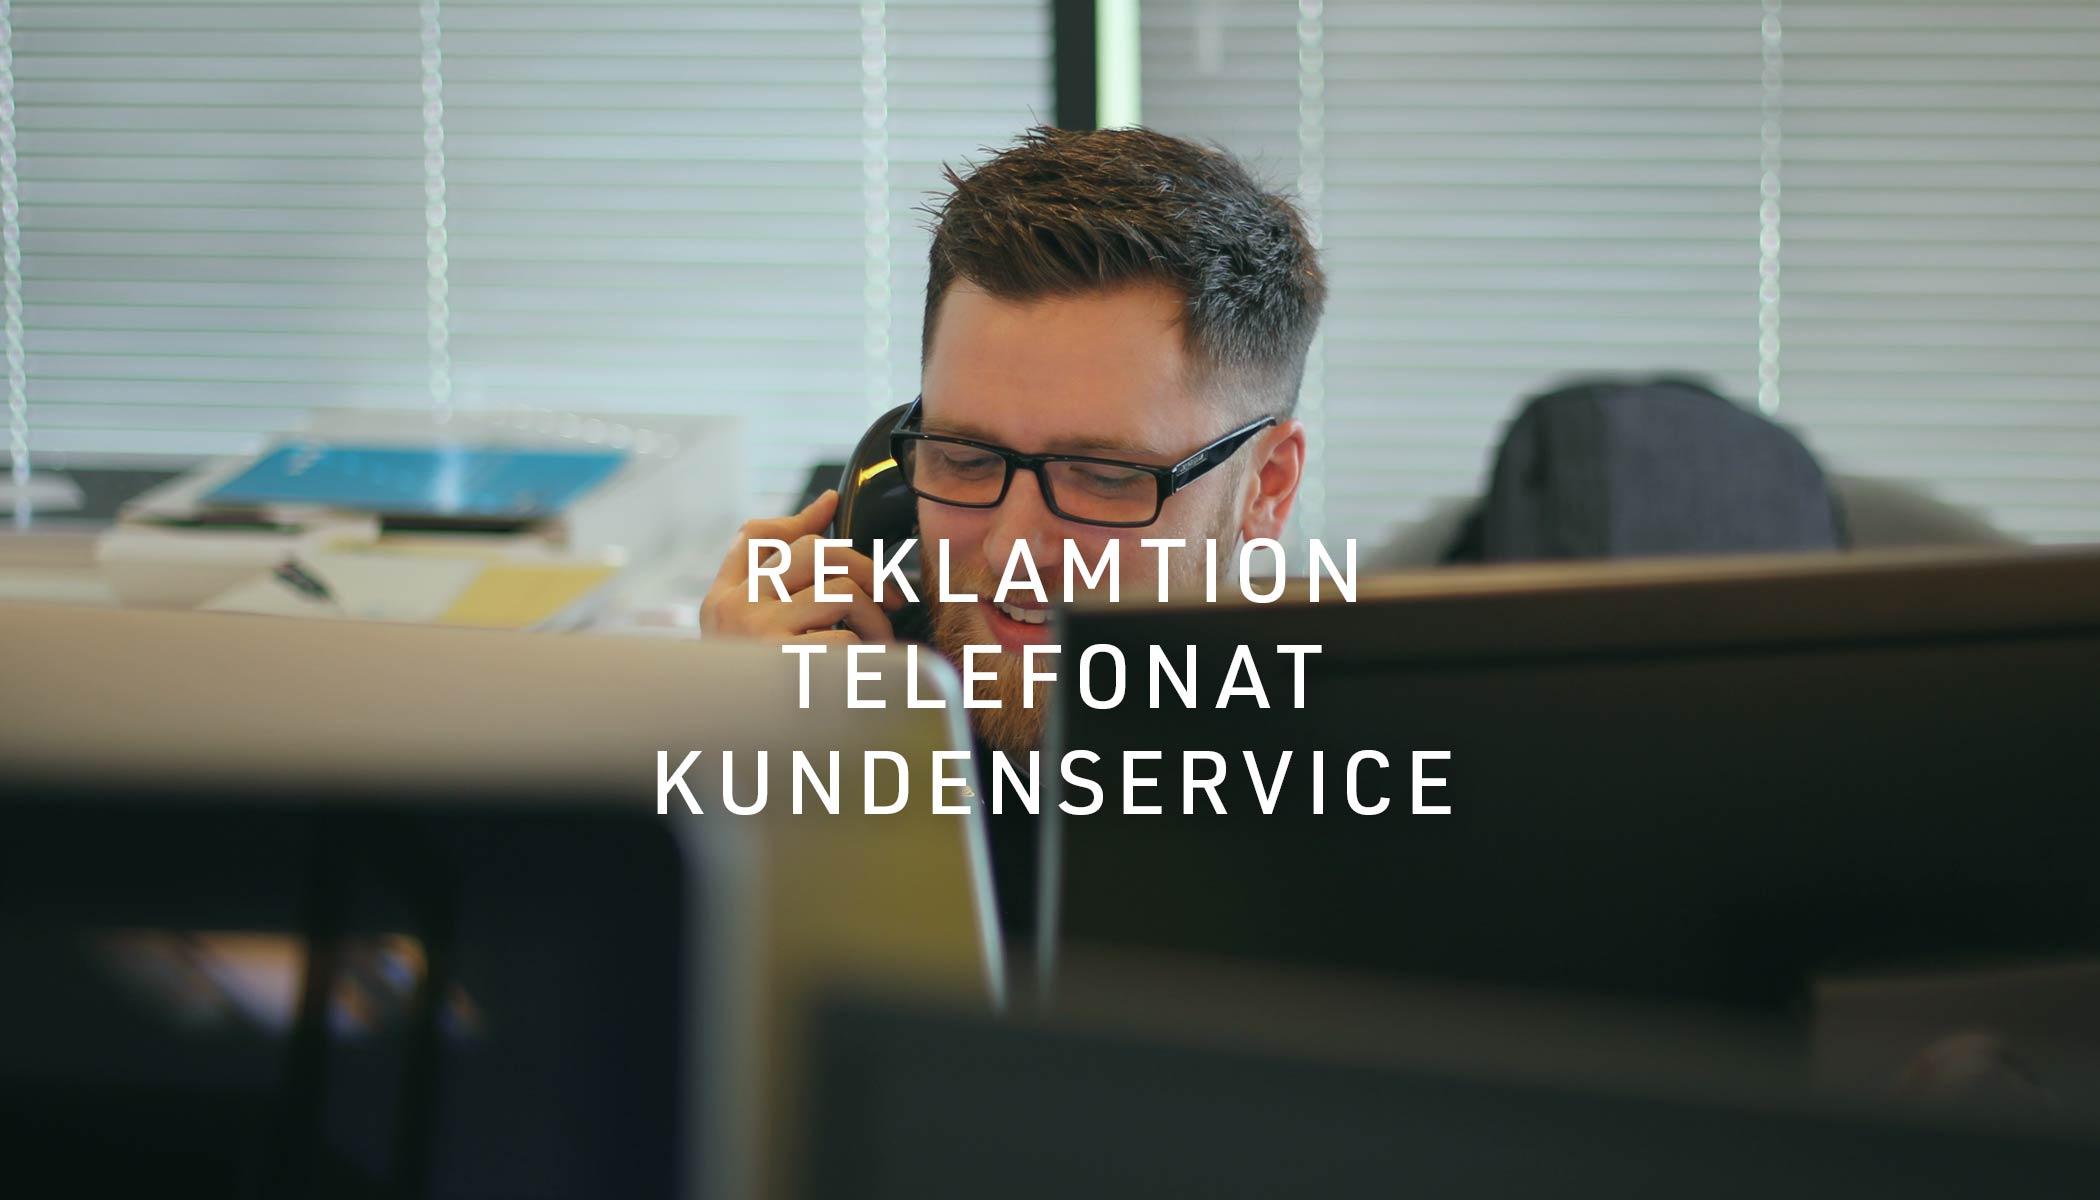 Reklamation - Telefonat - Kundenservice